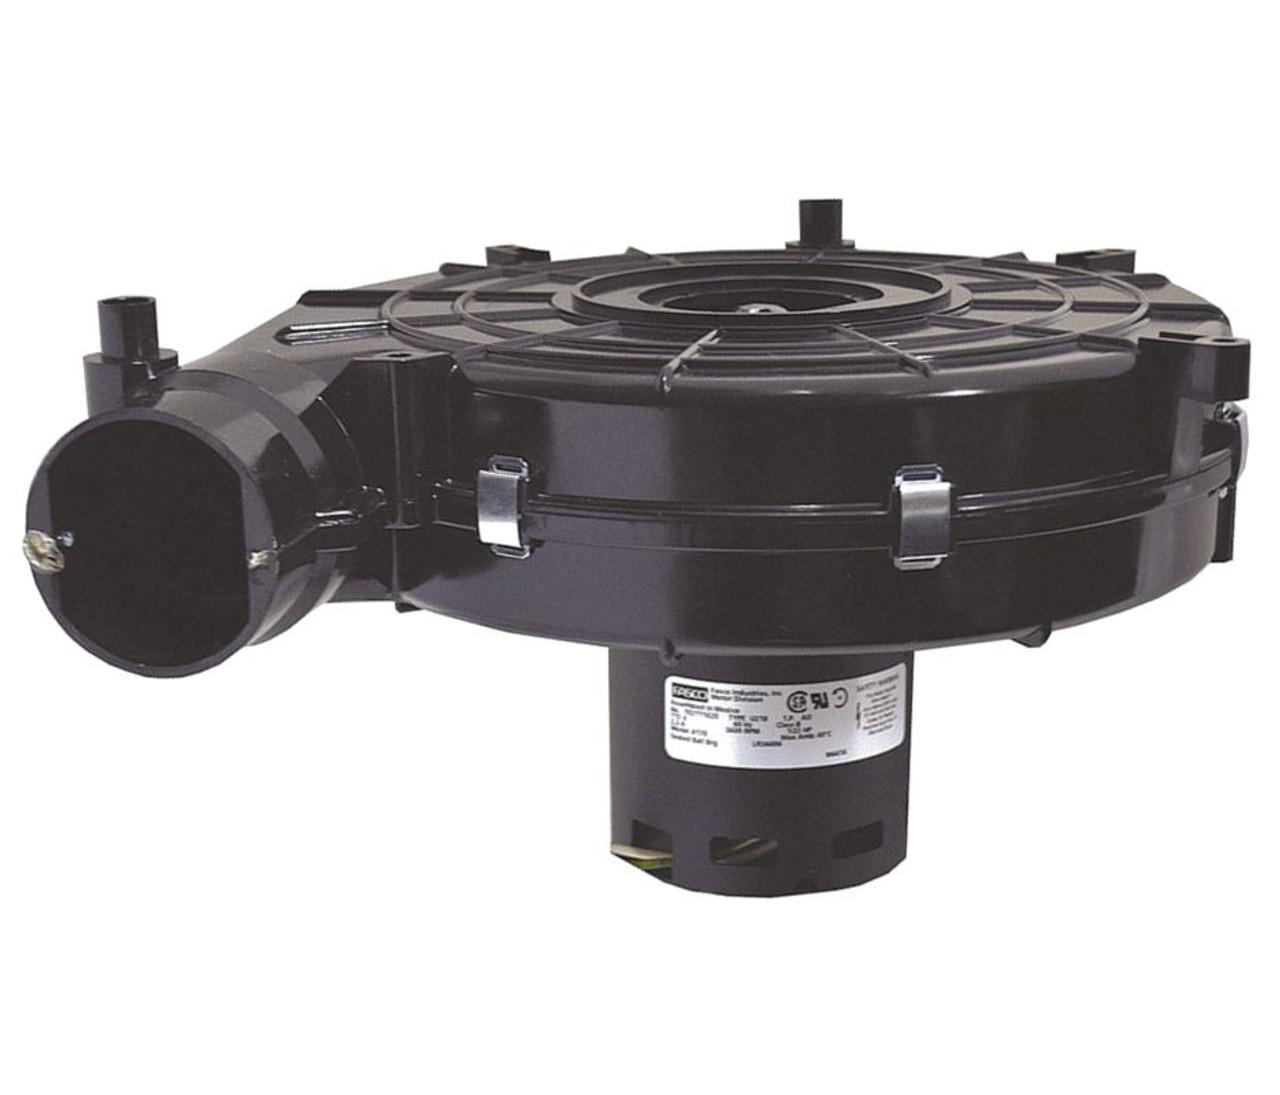 5BE66 Dayton 1/2 HP Direct Drive Blower Motor 1140 RPM 115